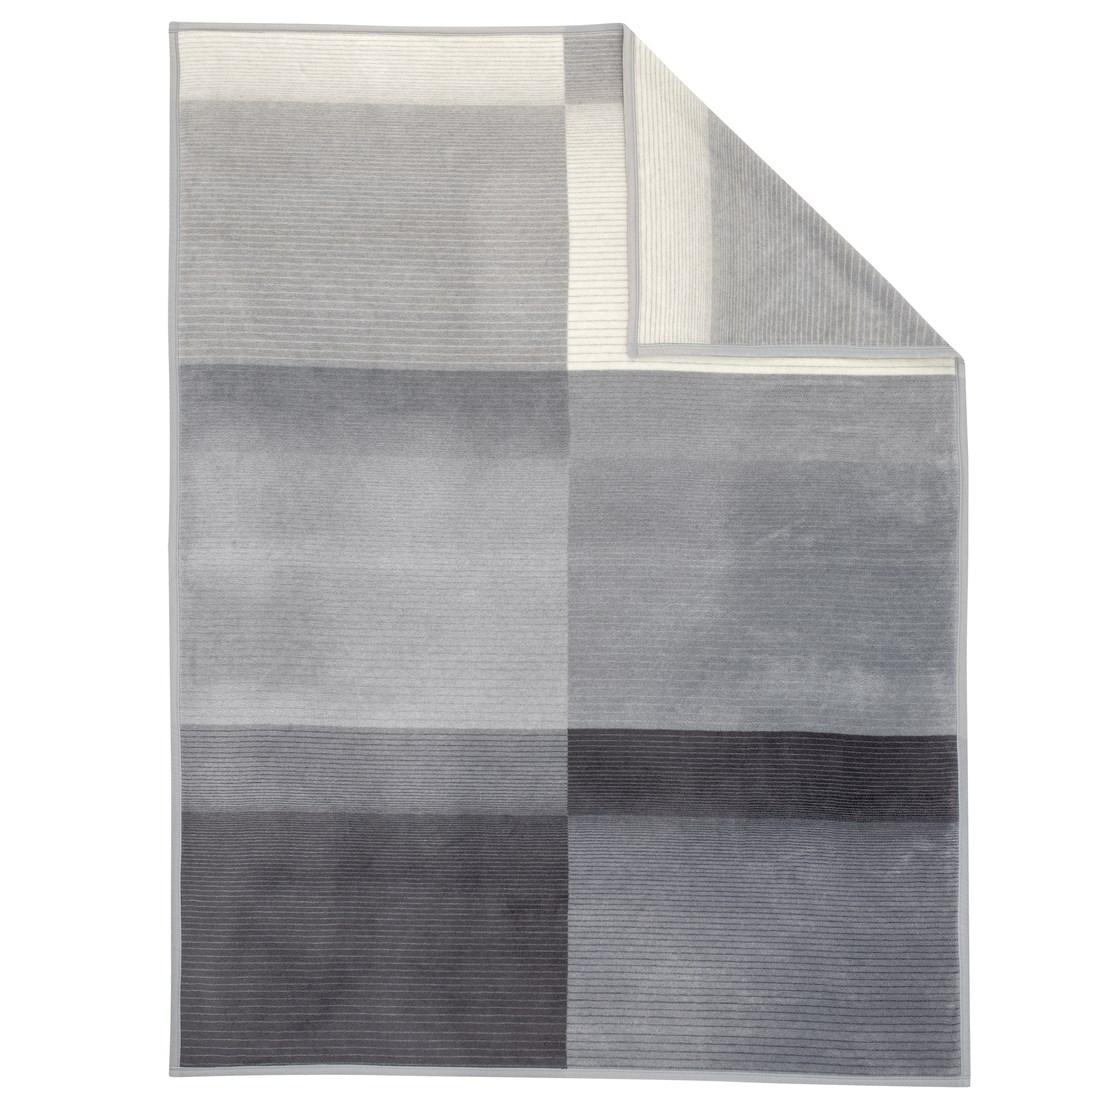 ibena deka granada 1442 800 150 x 200 cm luxusn poste n bielize. Black Bedroom Furniture Sets. Home Design Ideas